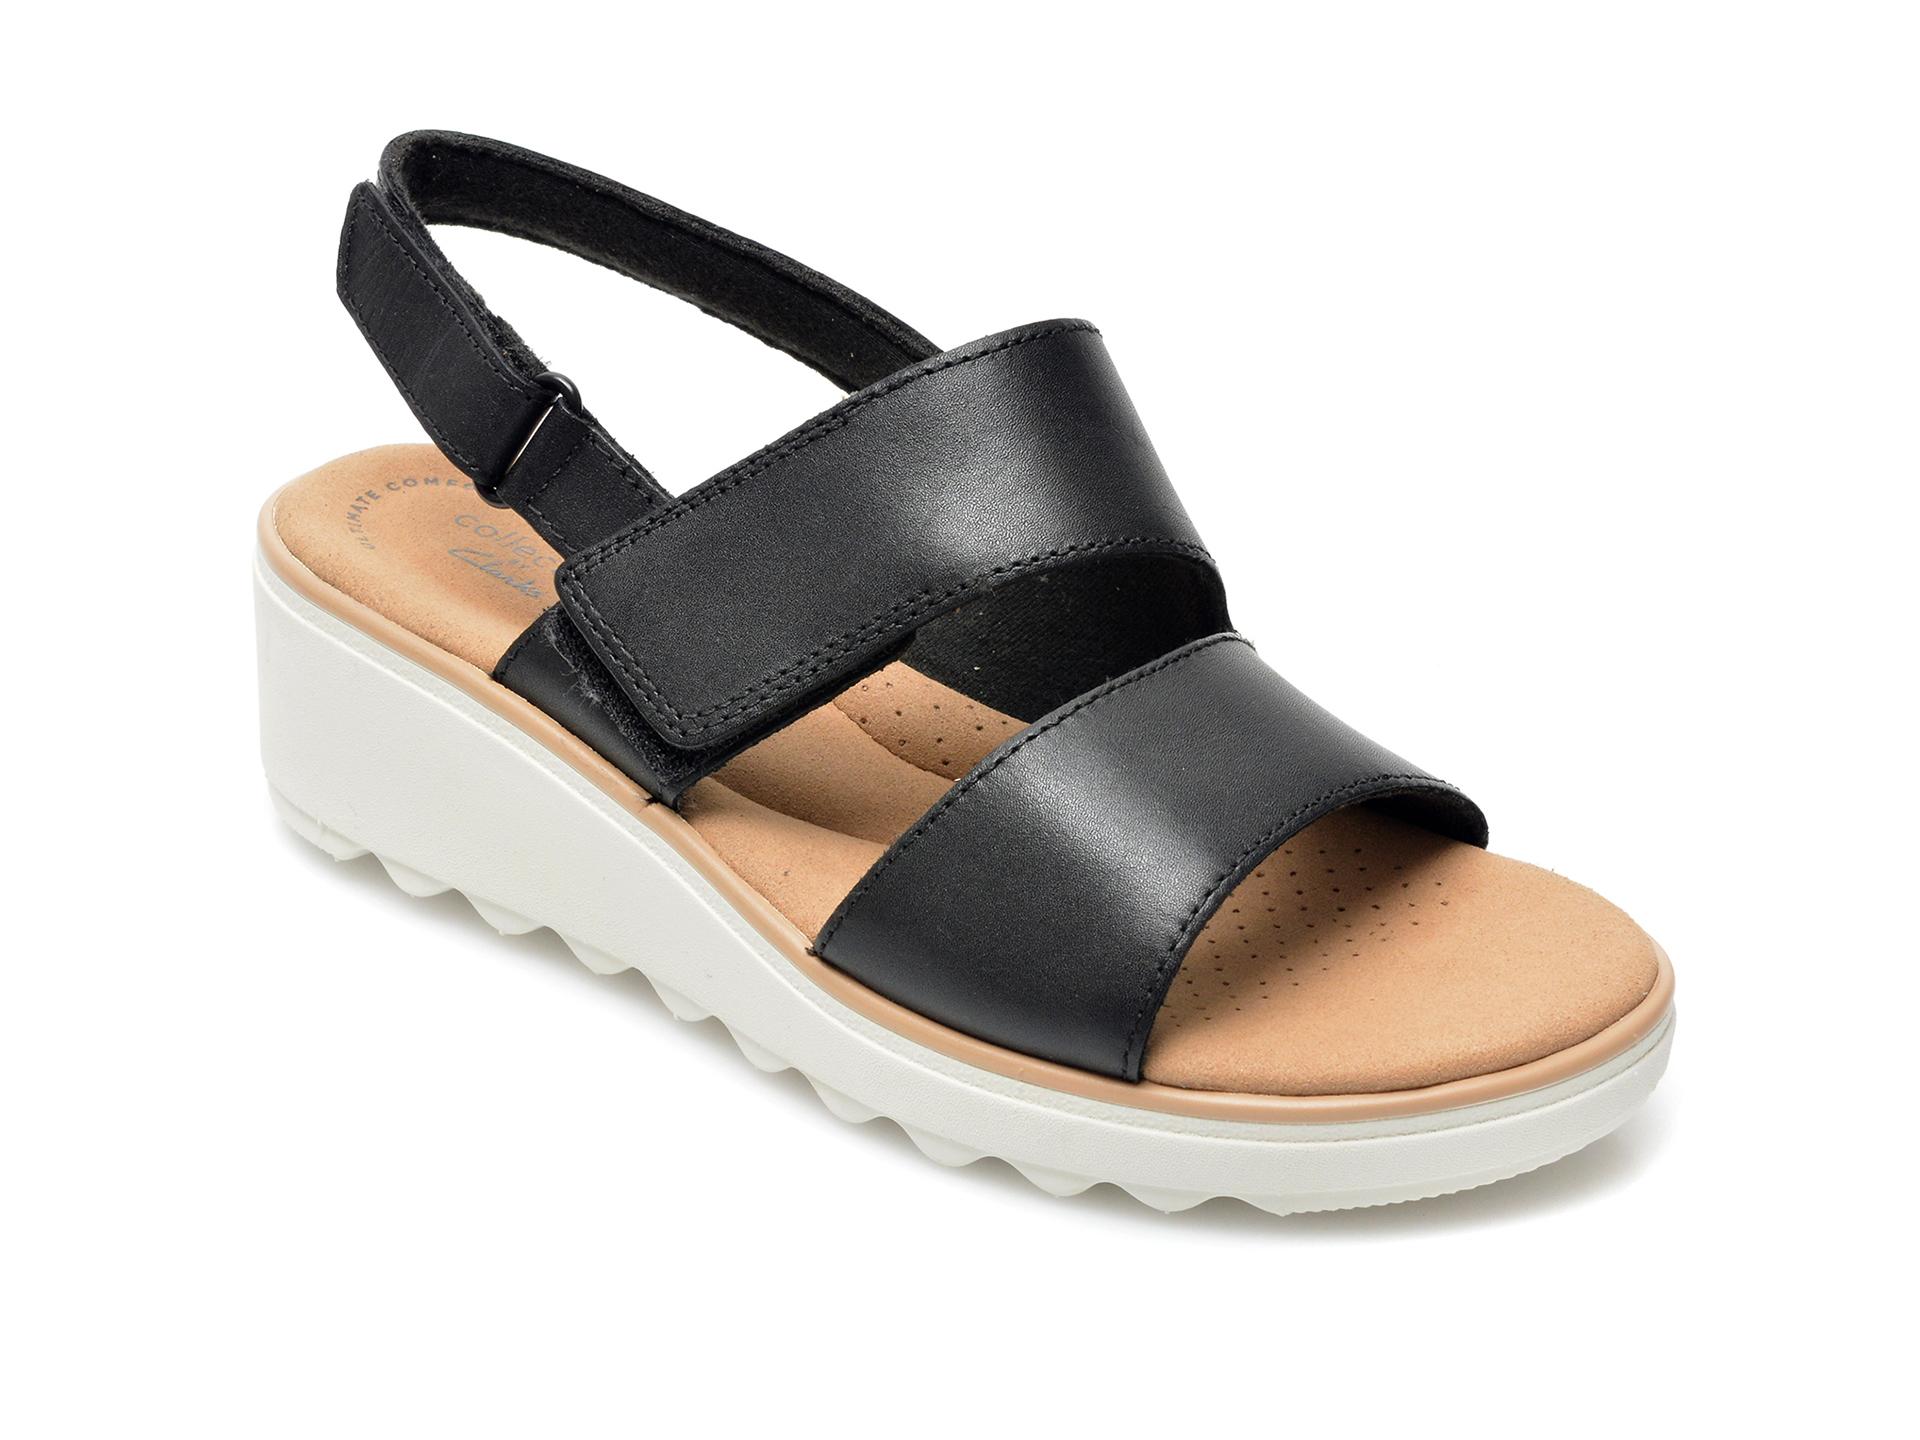 Sandale CLARKS negre, Jillian Pearl, din piele naturala imagine otter.ro 2021